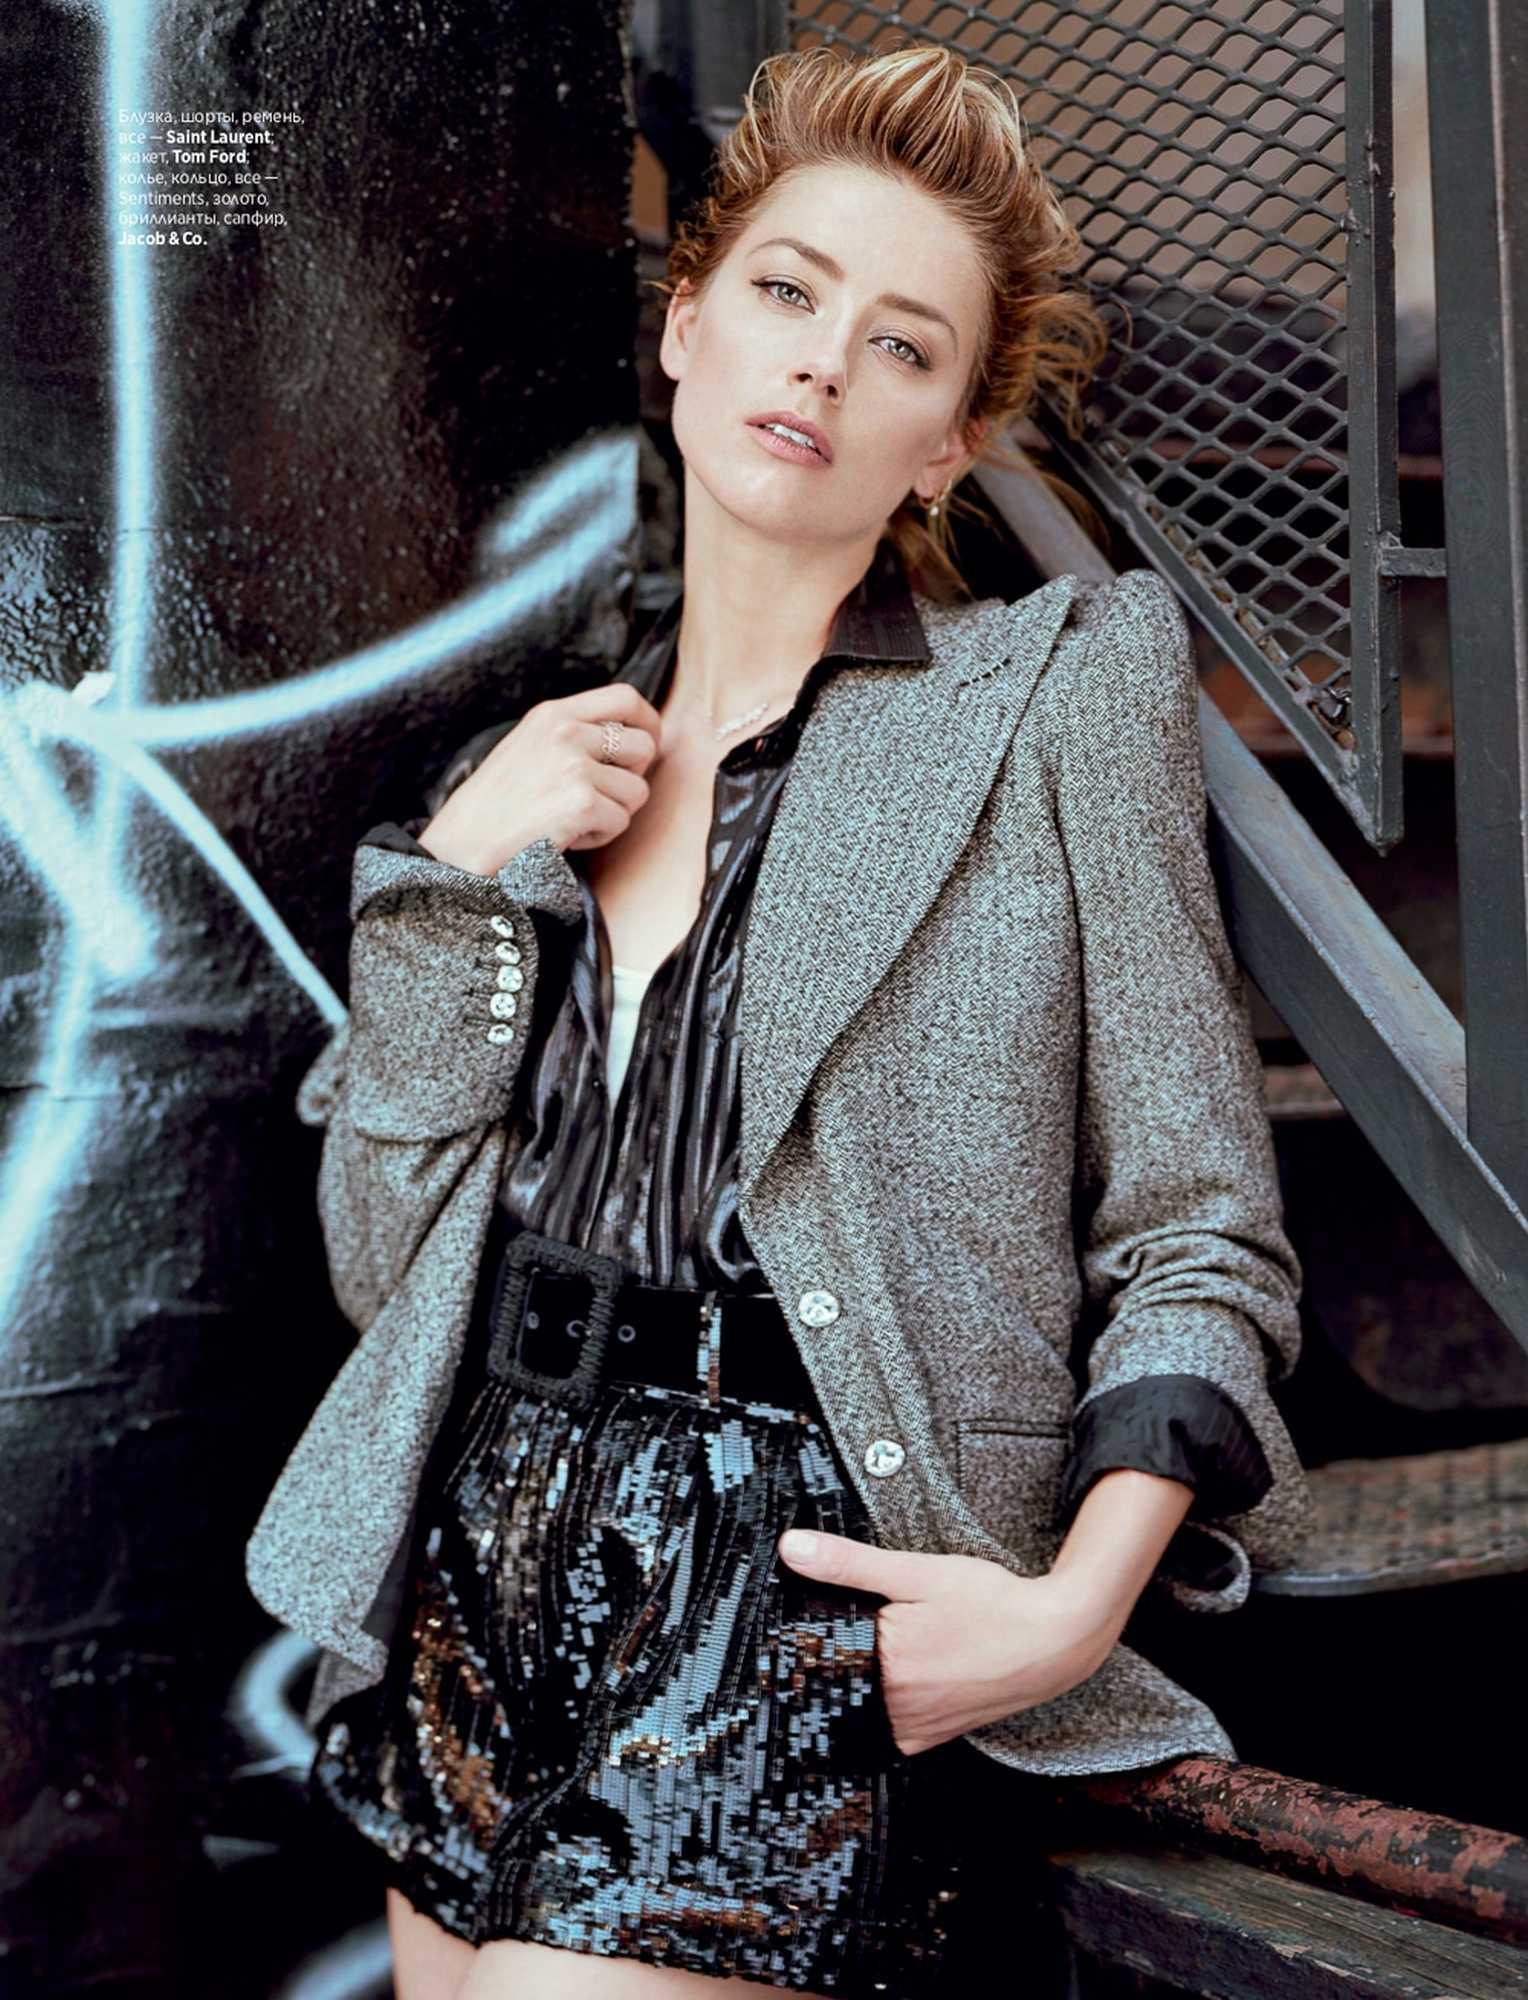 Amber-Heard-InStyle-Russia-December-20183.jpg